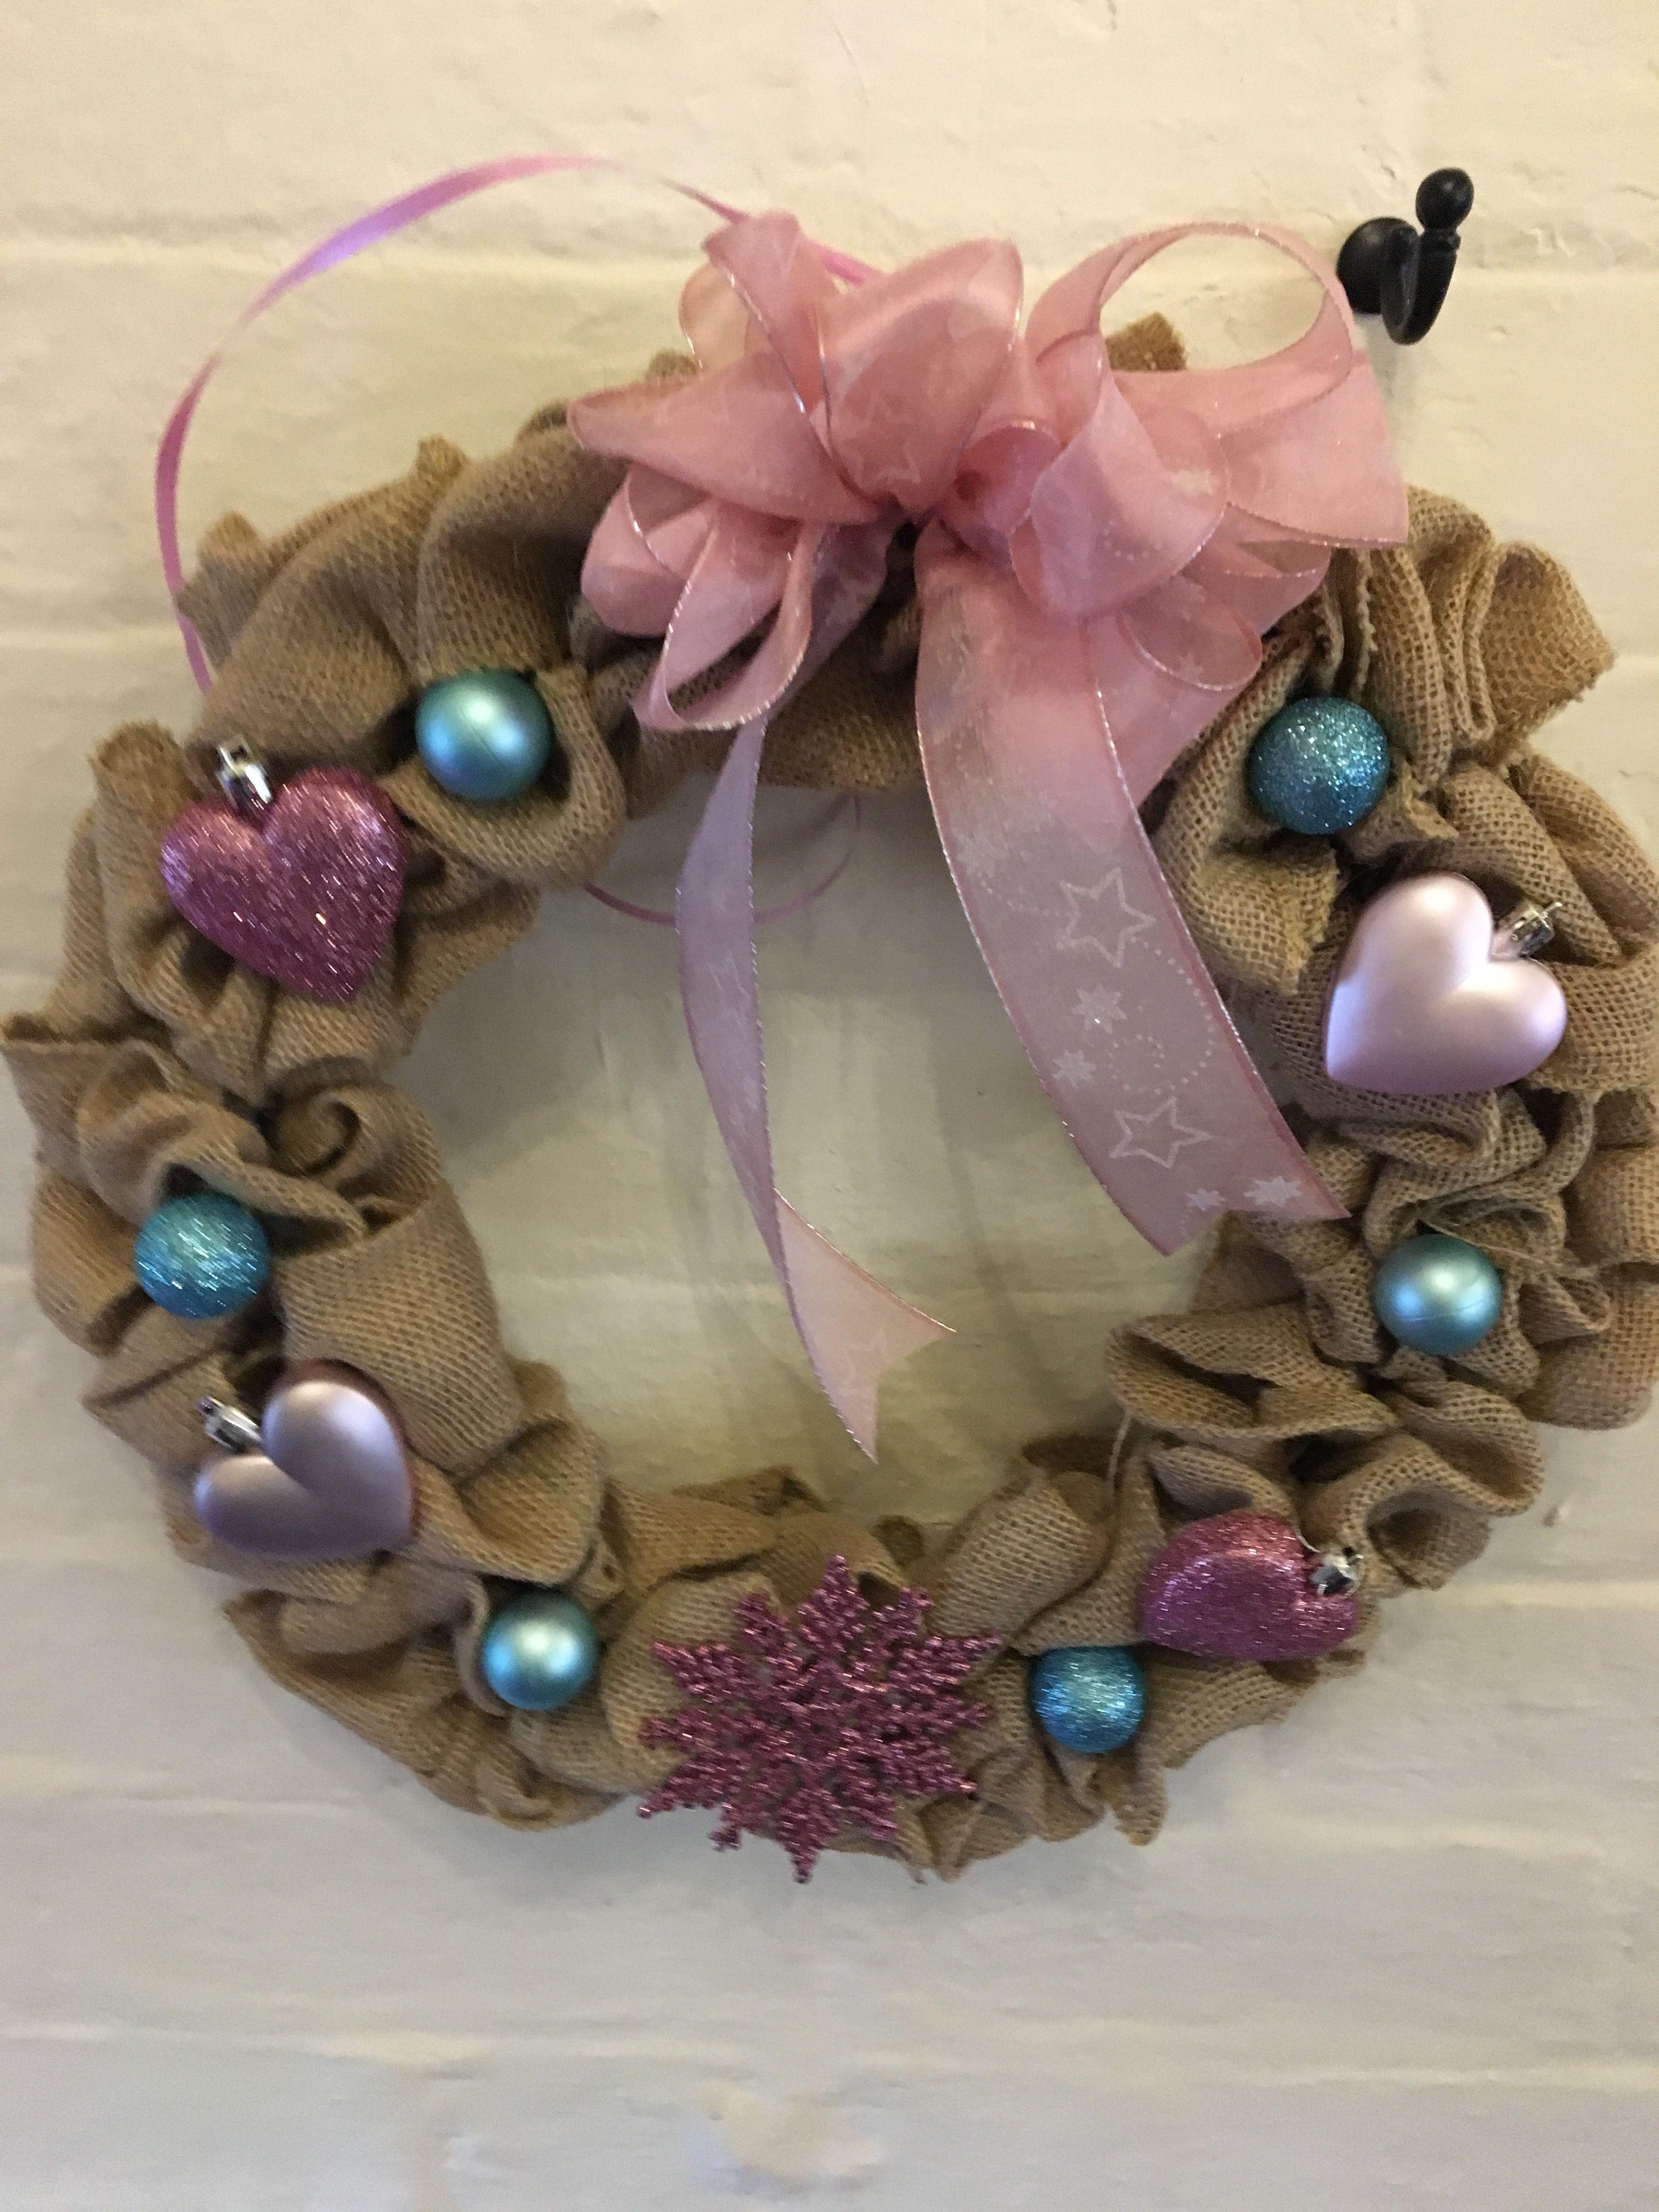 Handmade pink and turquoise hessian Christmas Wreath with hearts and snowflake very kawaii